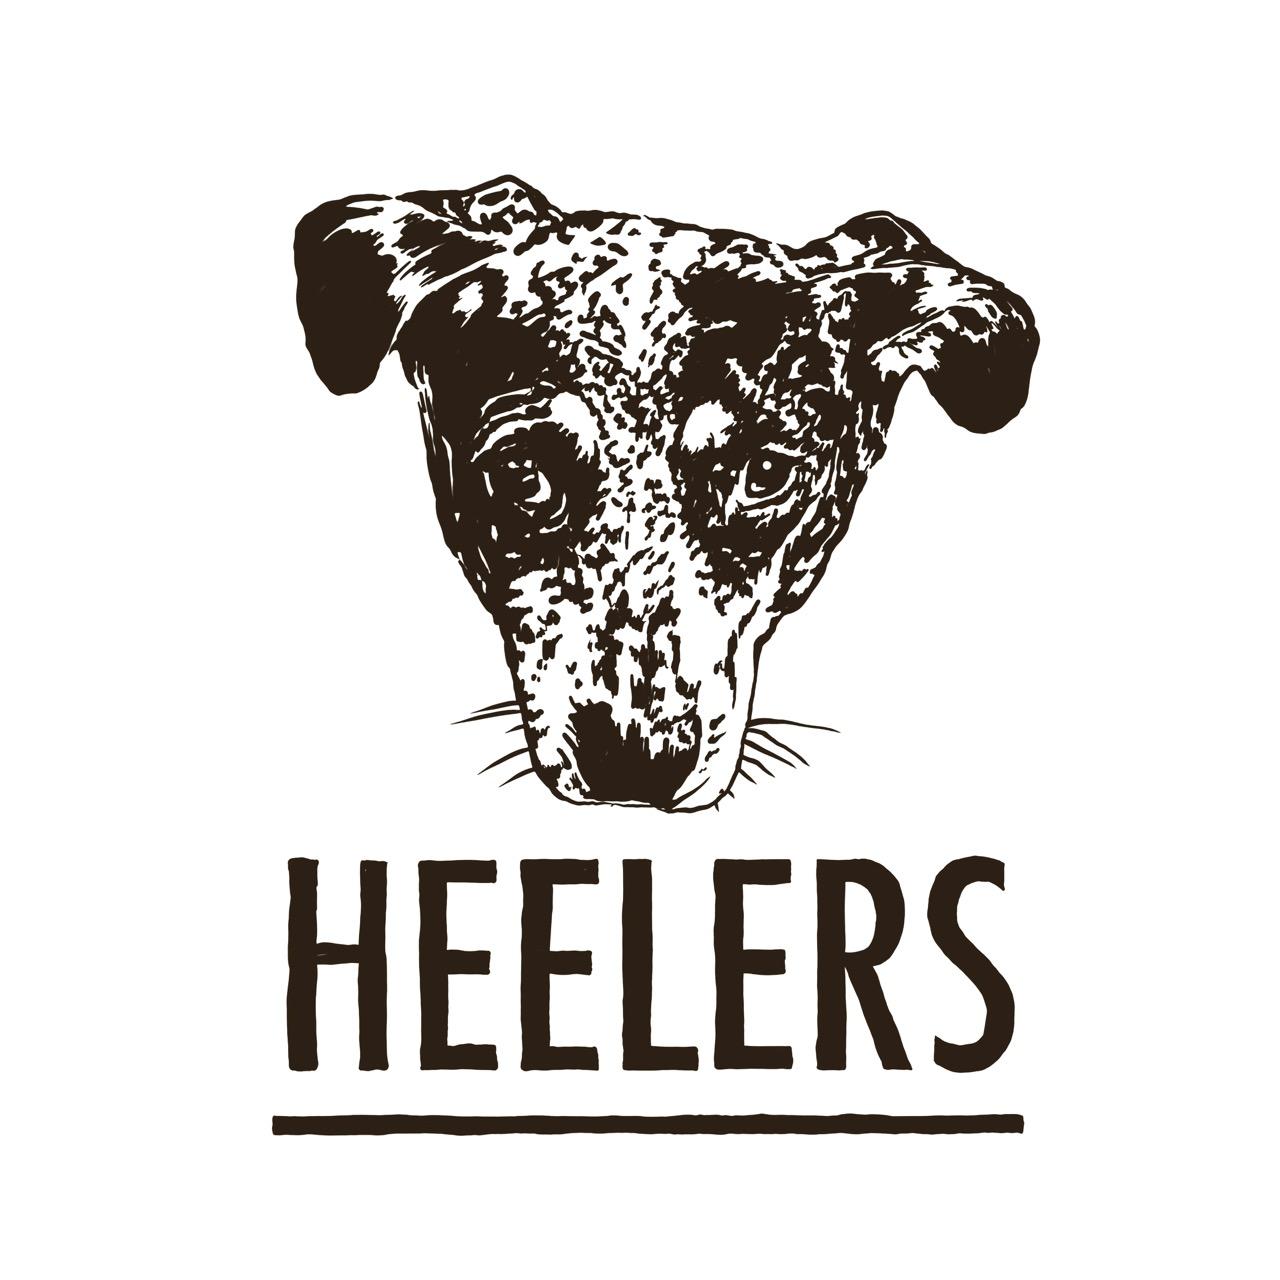 Heelers logo black